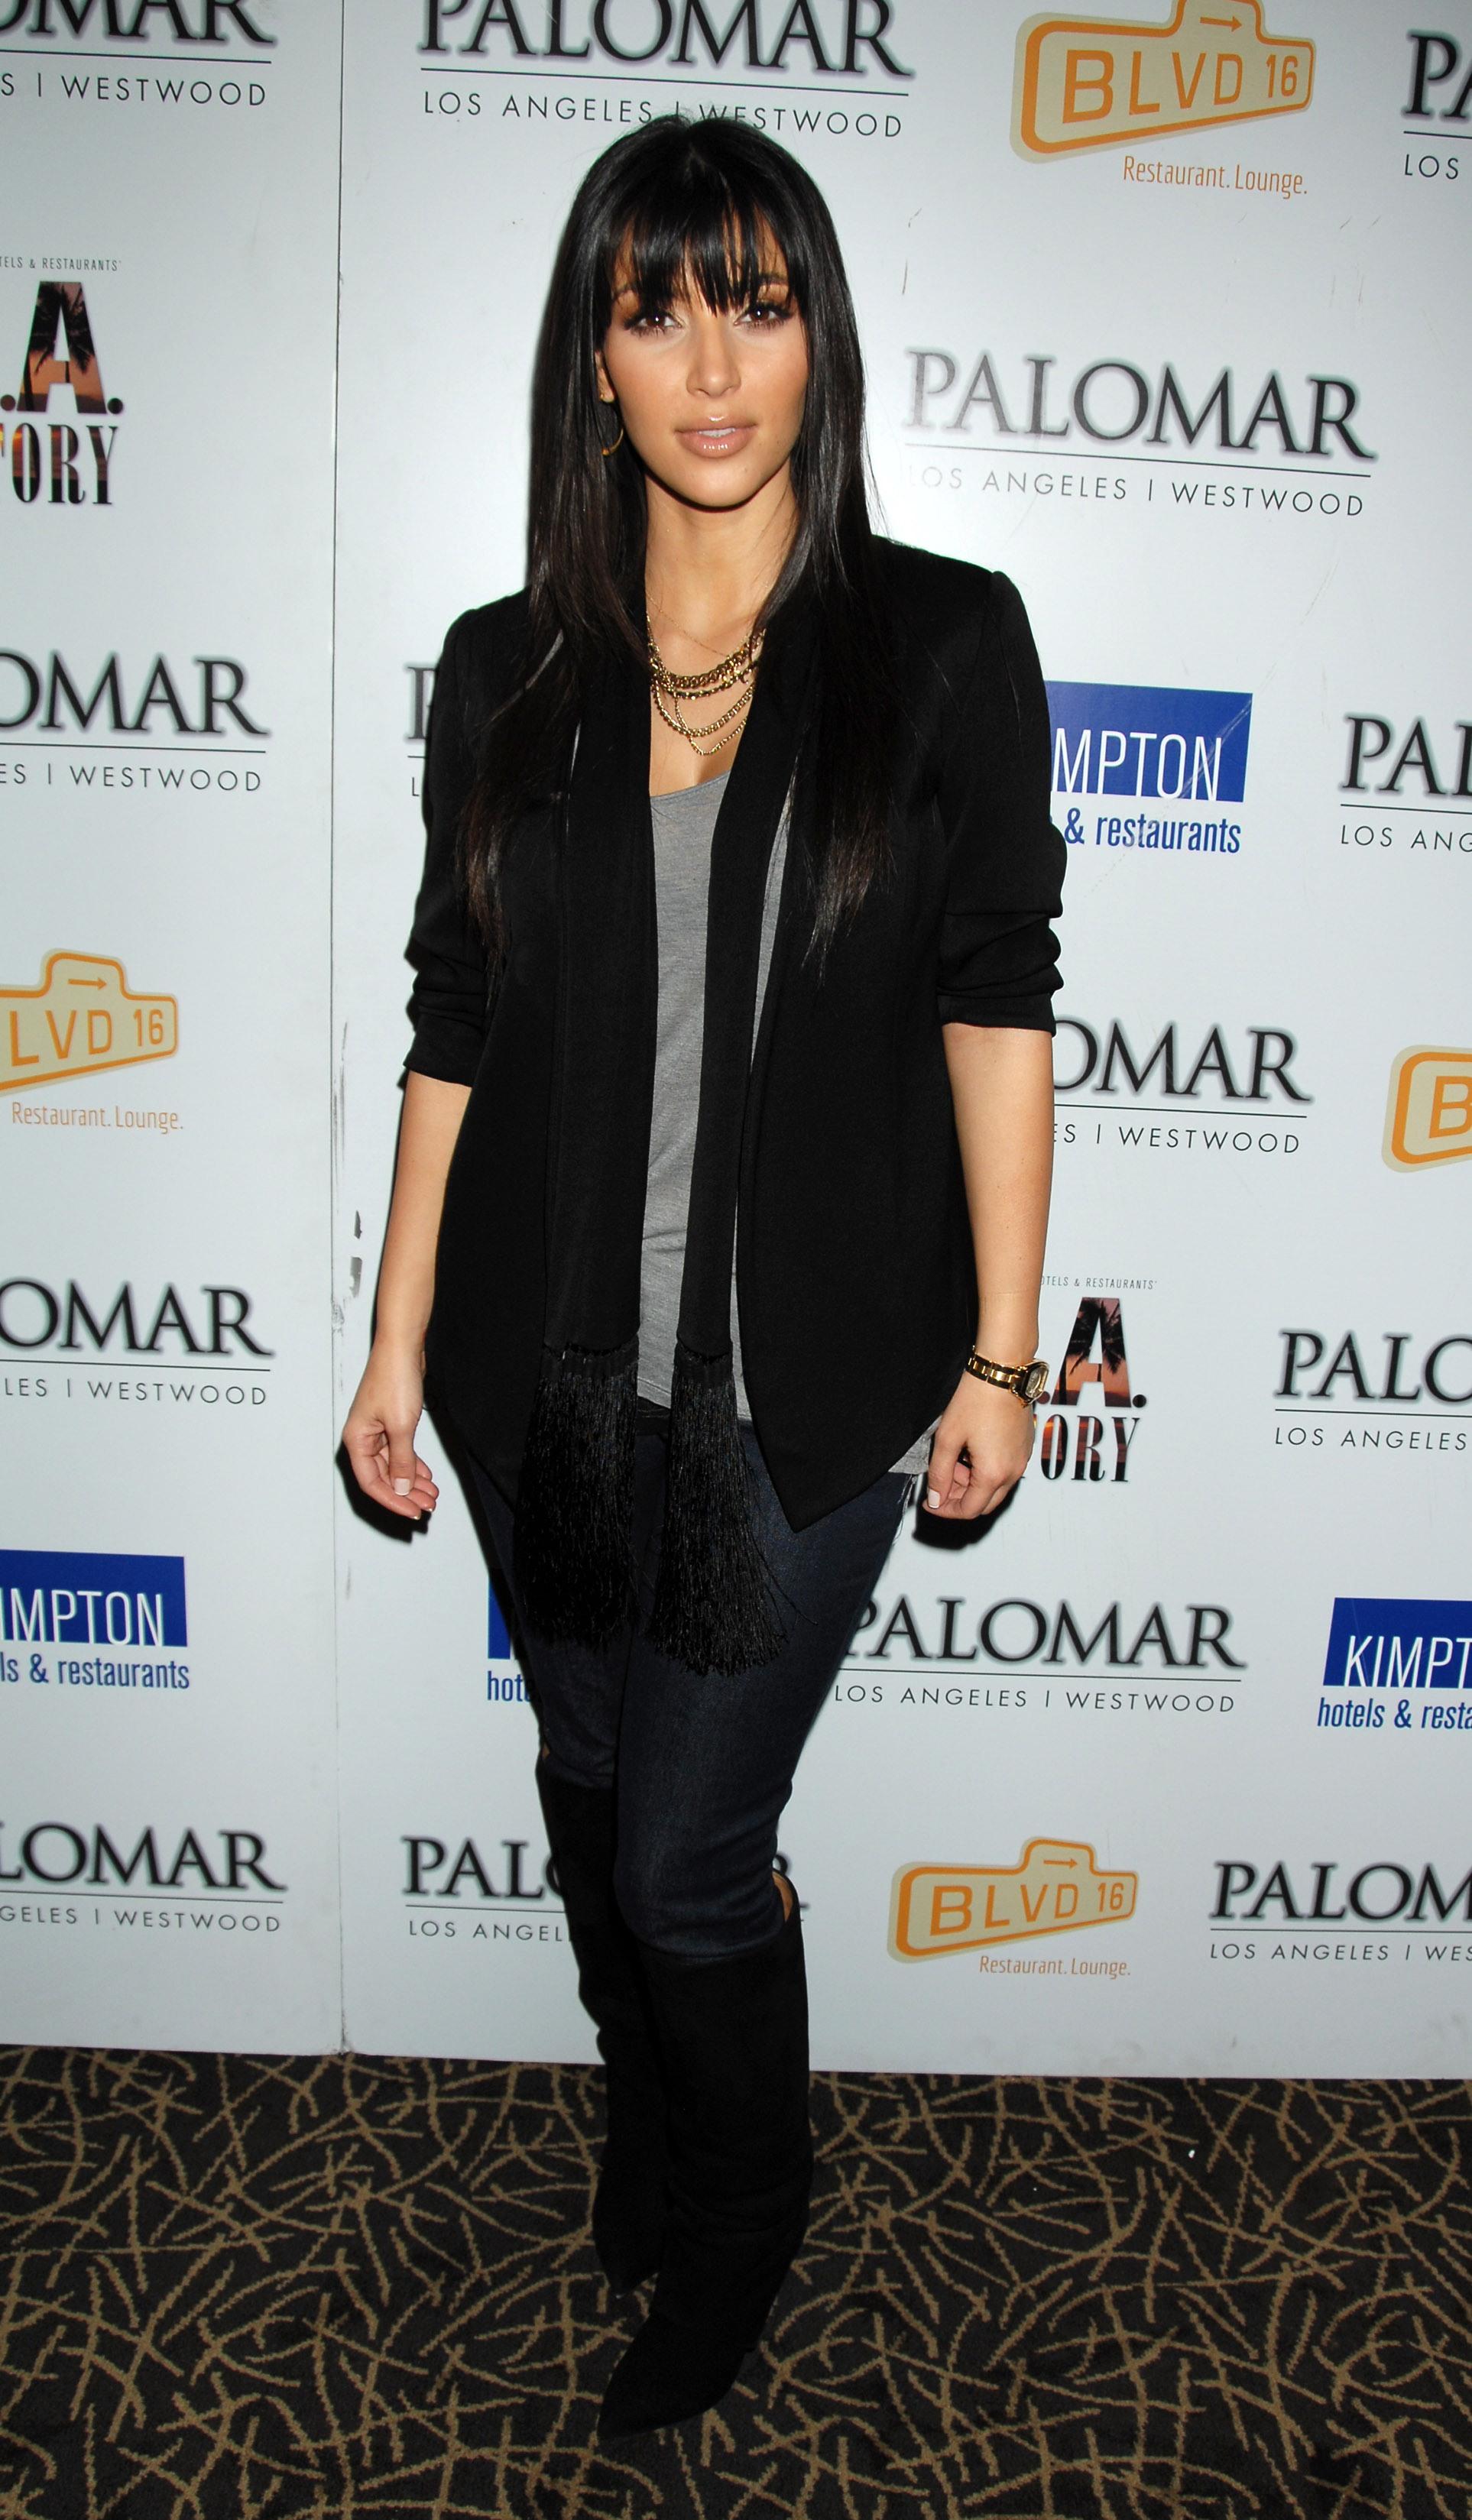 03323_Kim_Kardashian_2008-12-08_-_A_Night_For_Change_benefiting_Alternative_Intervention_Models_in_LA_064_122_1156lo.jpg